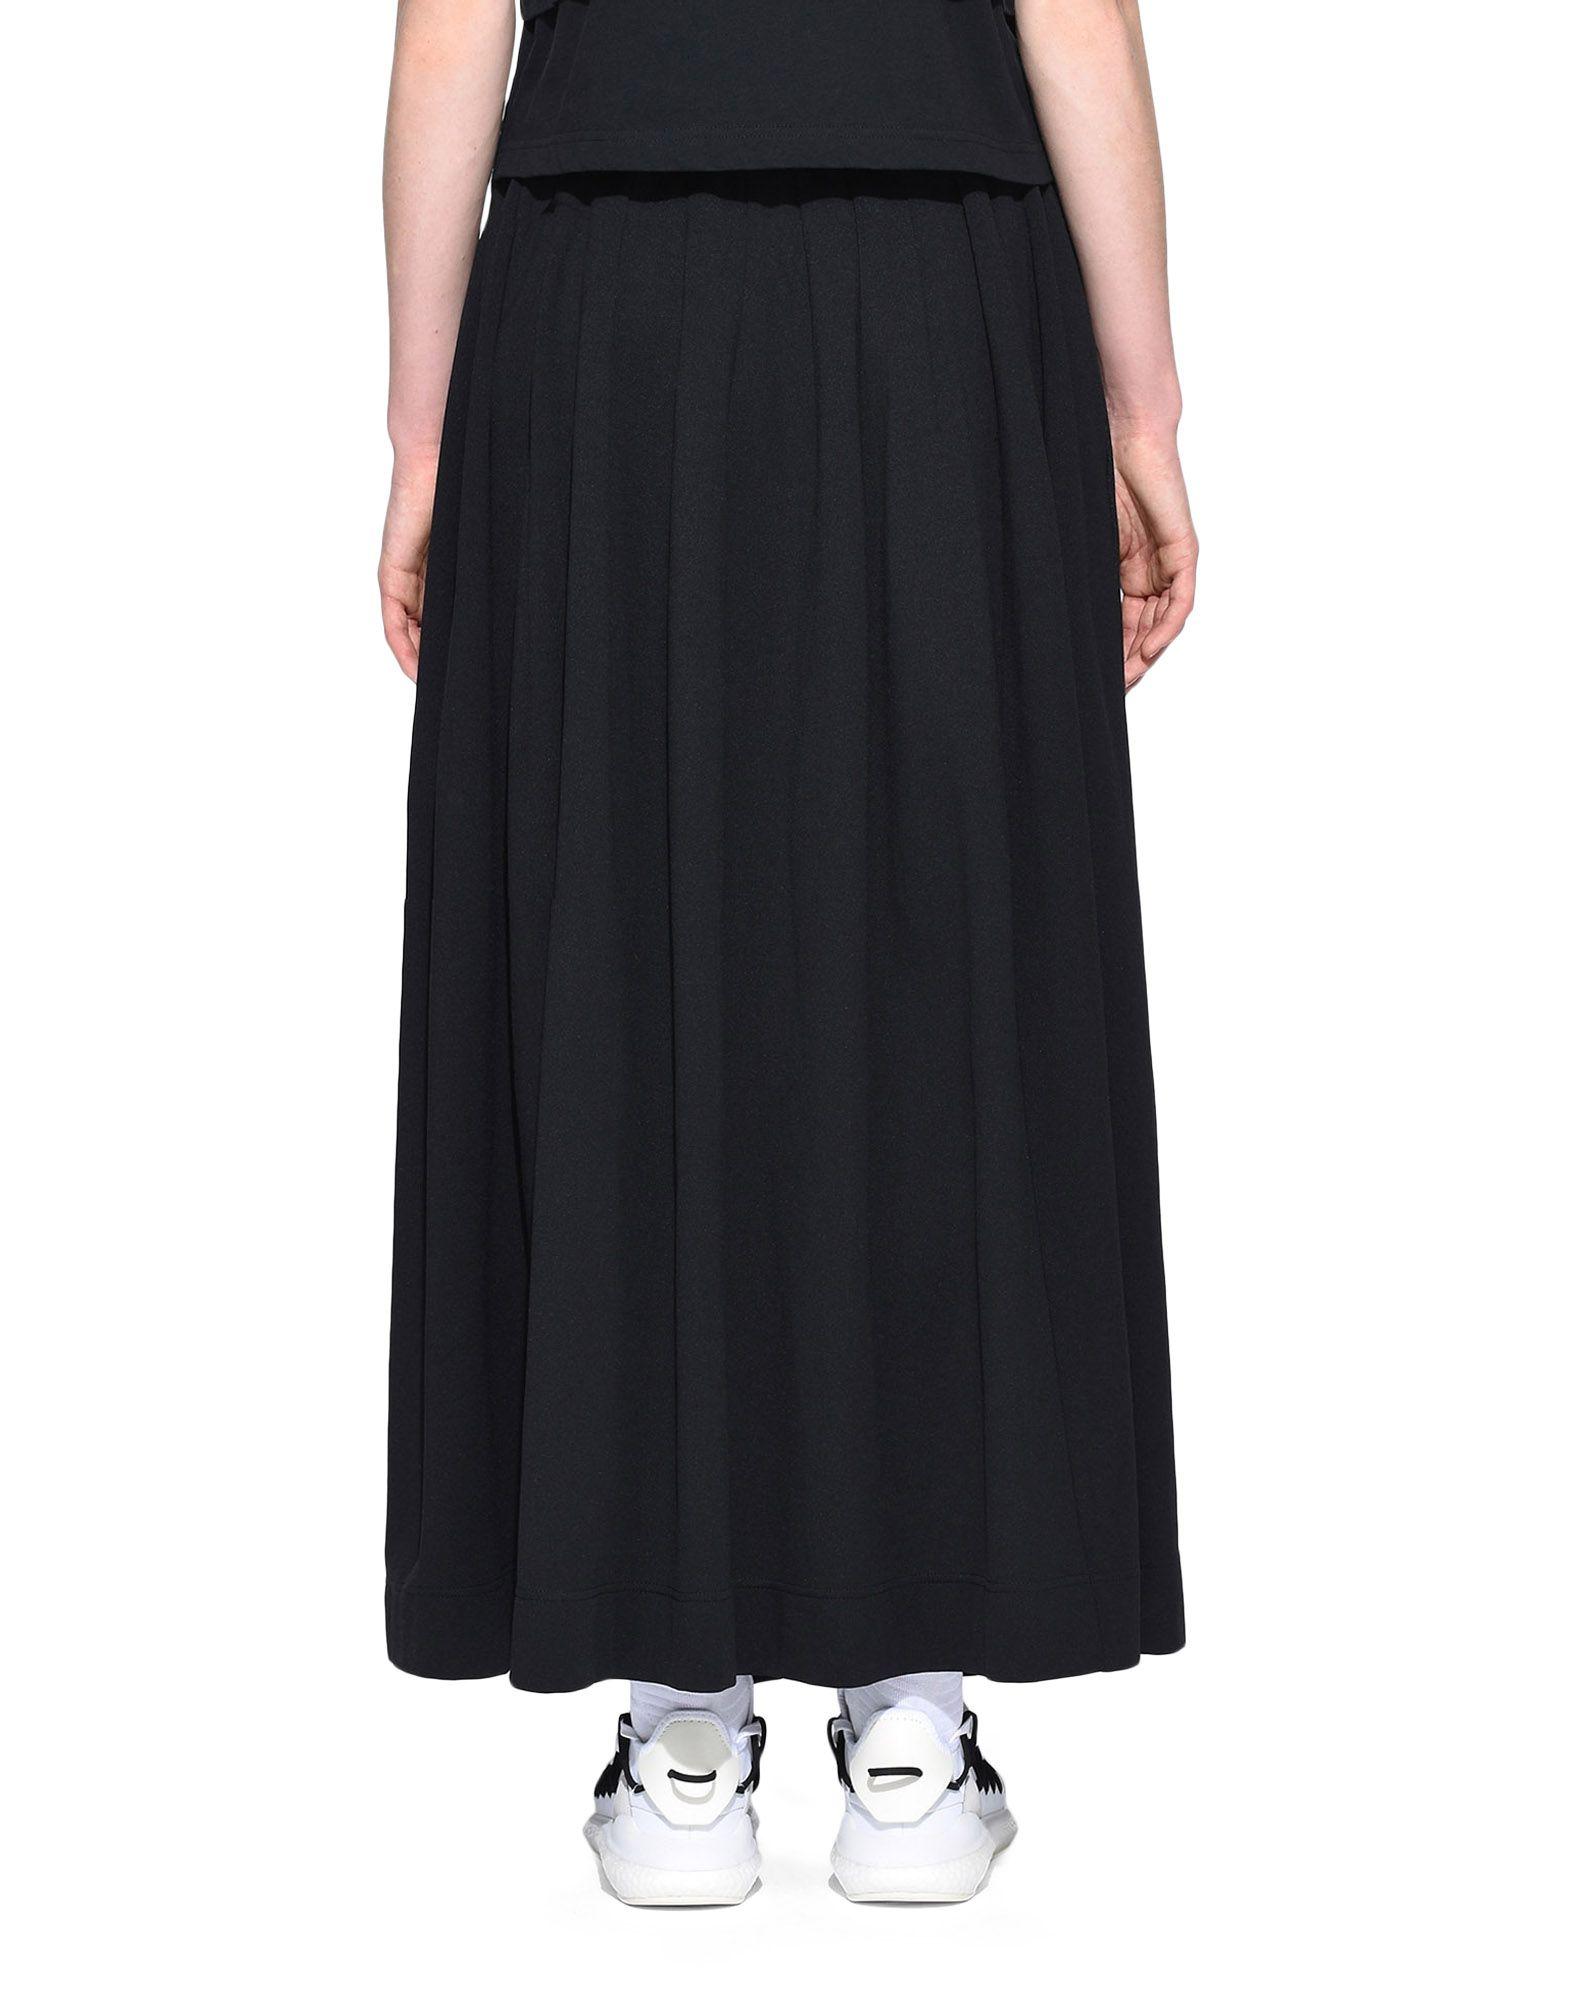 Y-3 Y-3 3-Stripes Selvedge Matte Track Skirt Юбка до колена Для Женщин d